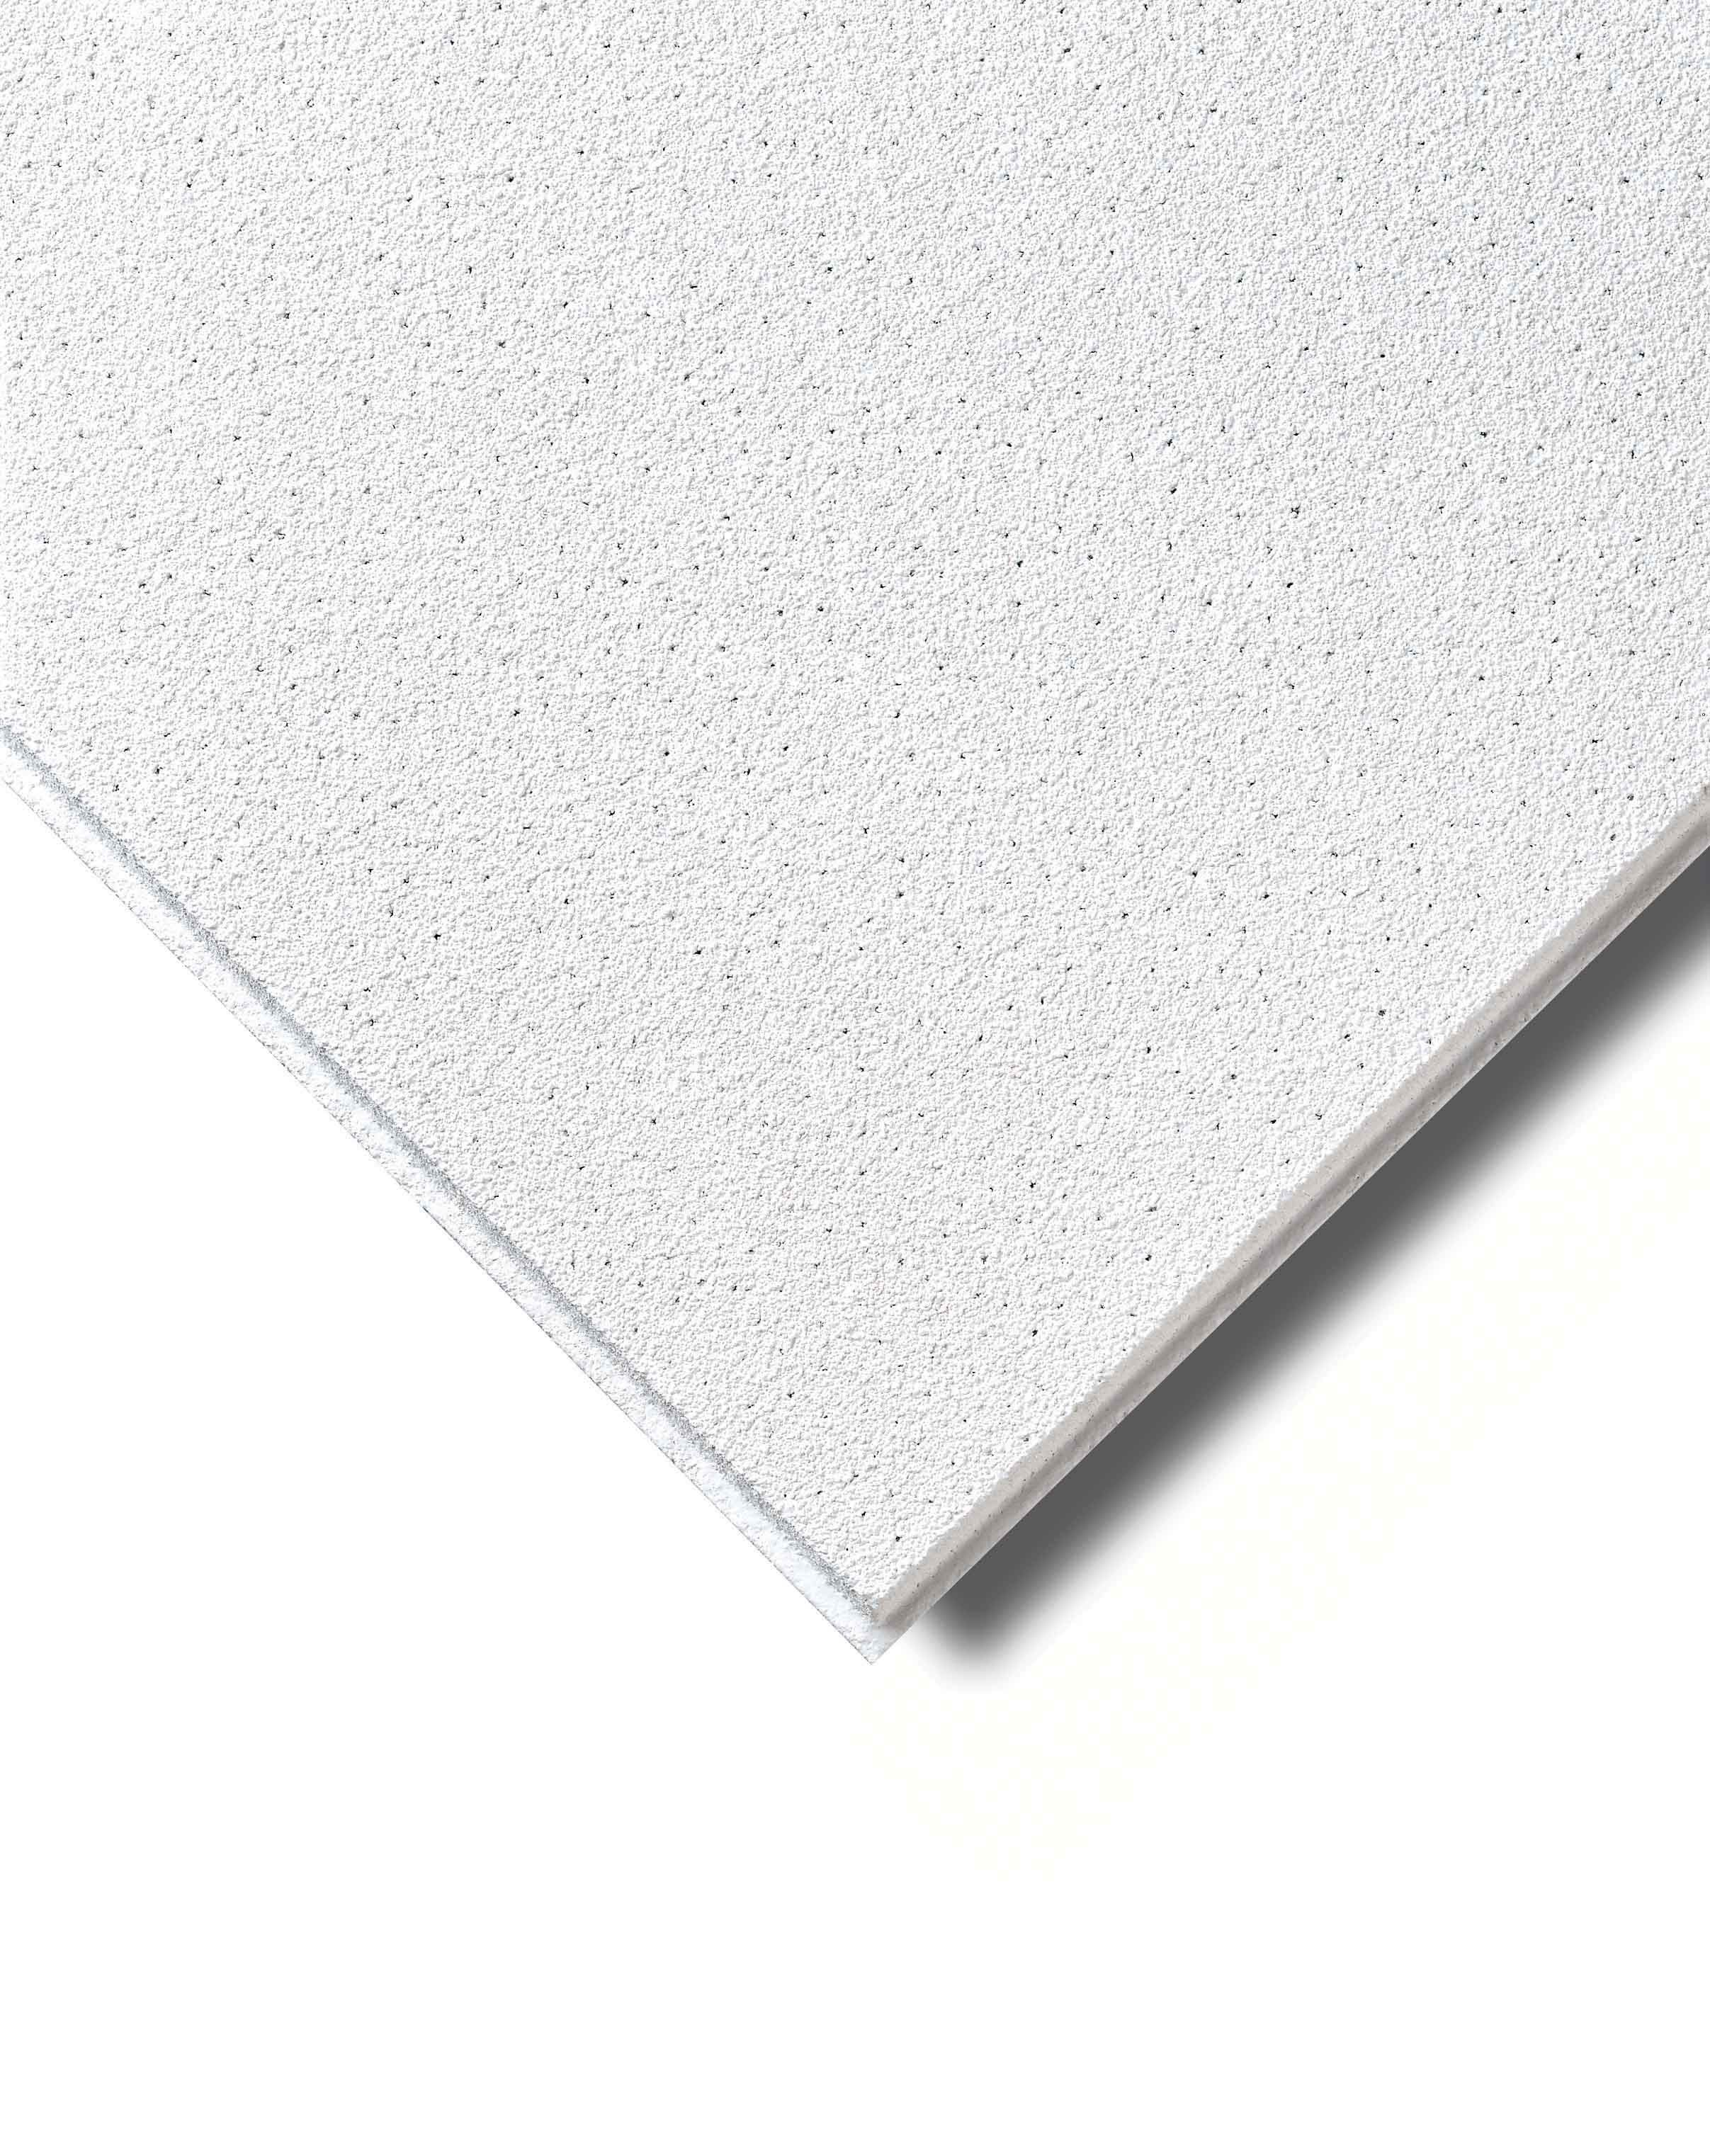 Ceiling Tiles 24 X 48 Home Design Ideas